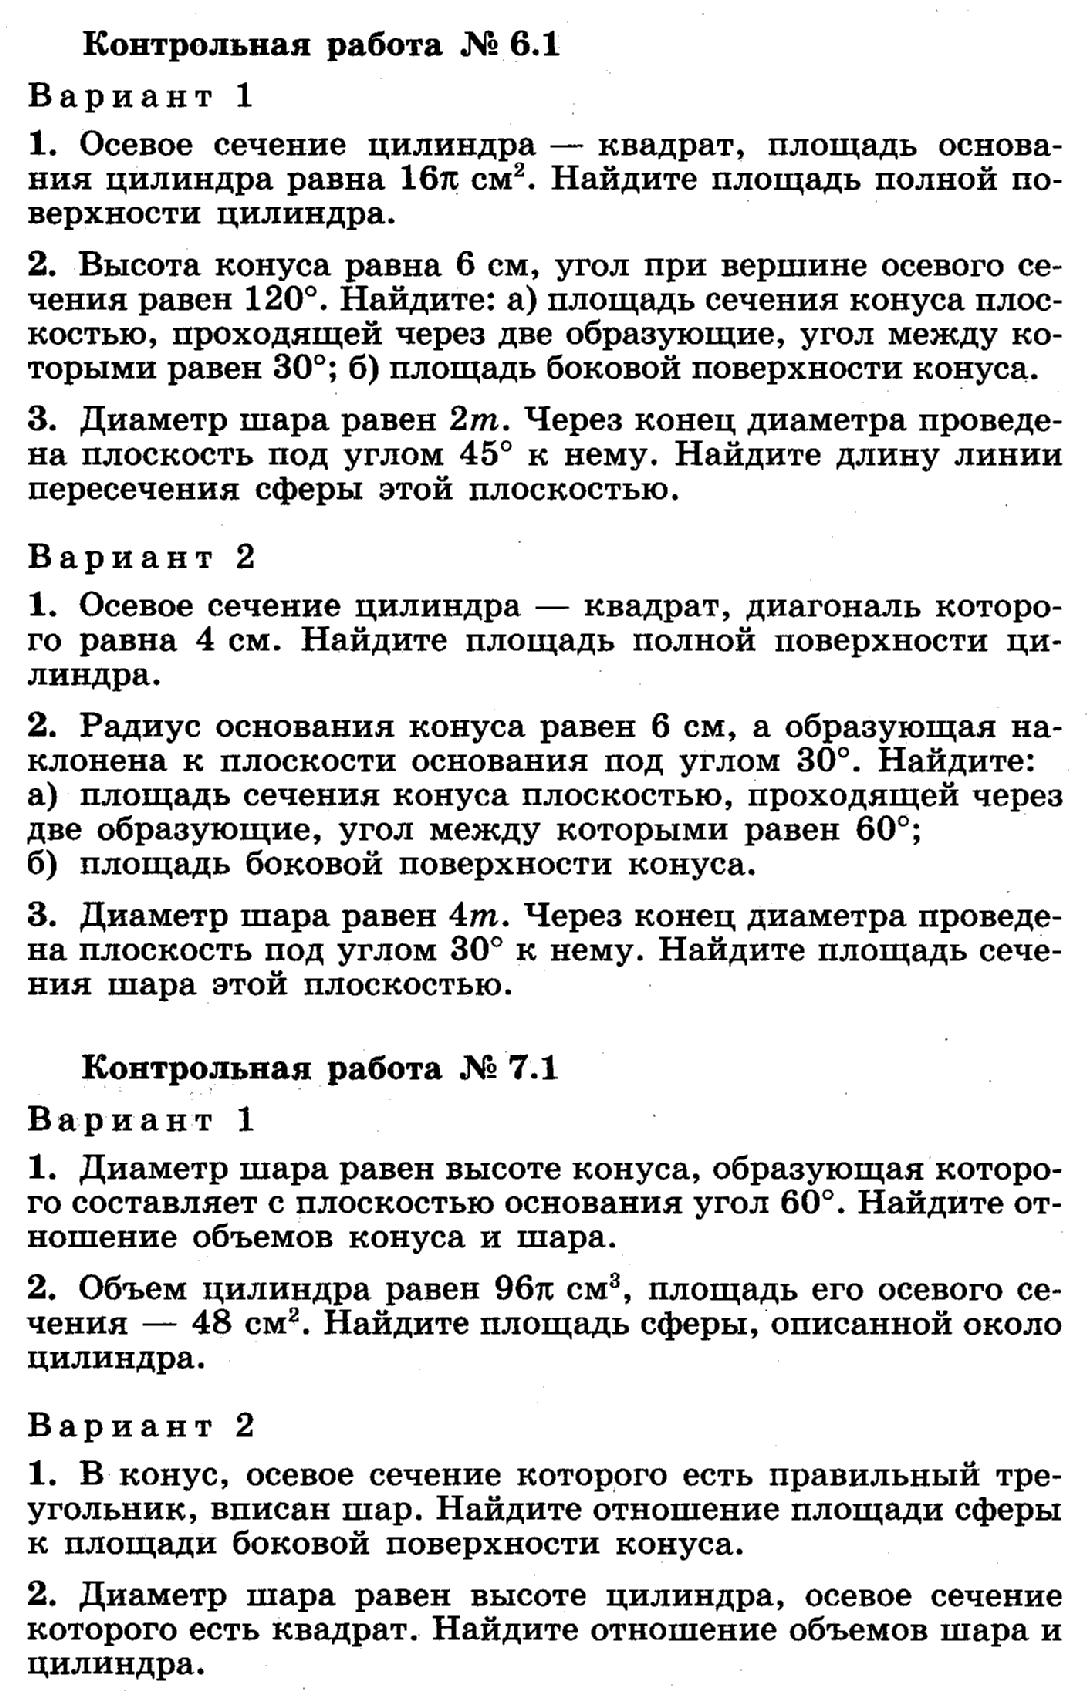 hello_html_5cebd4a1.png